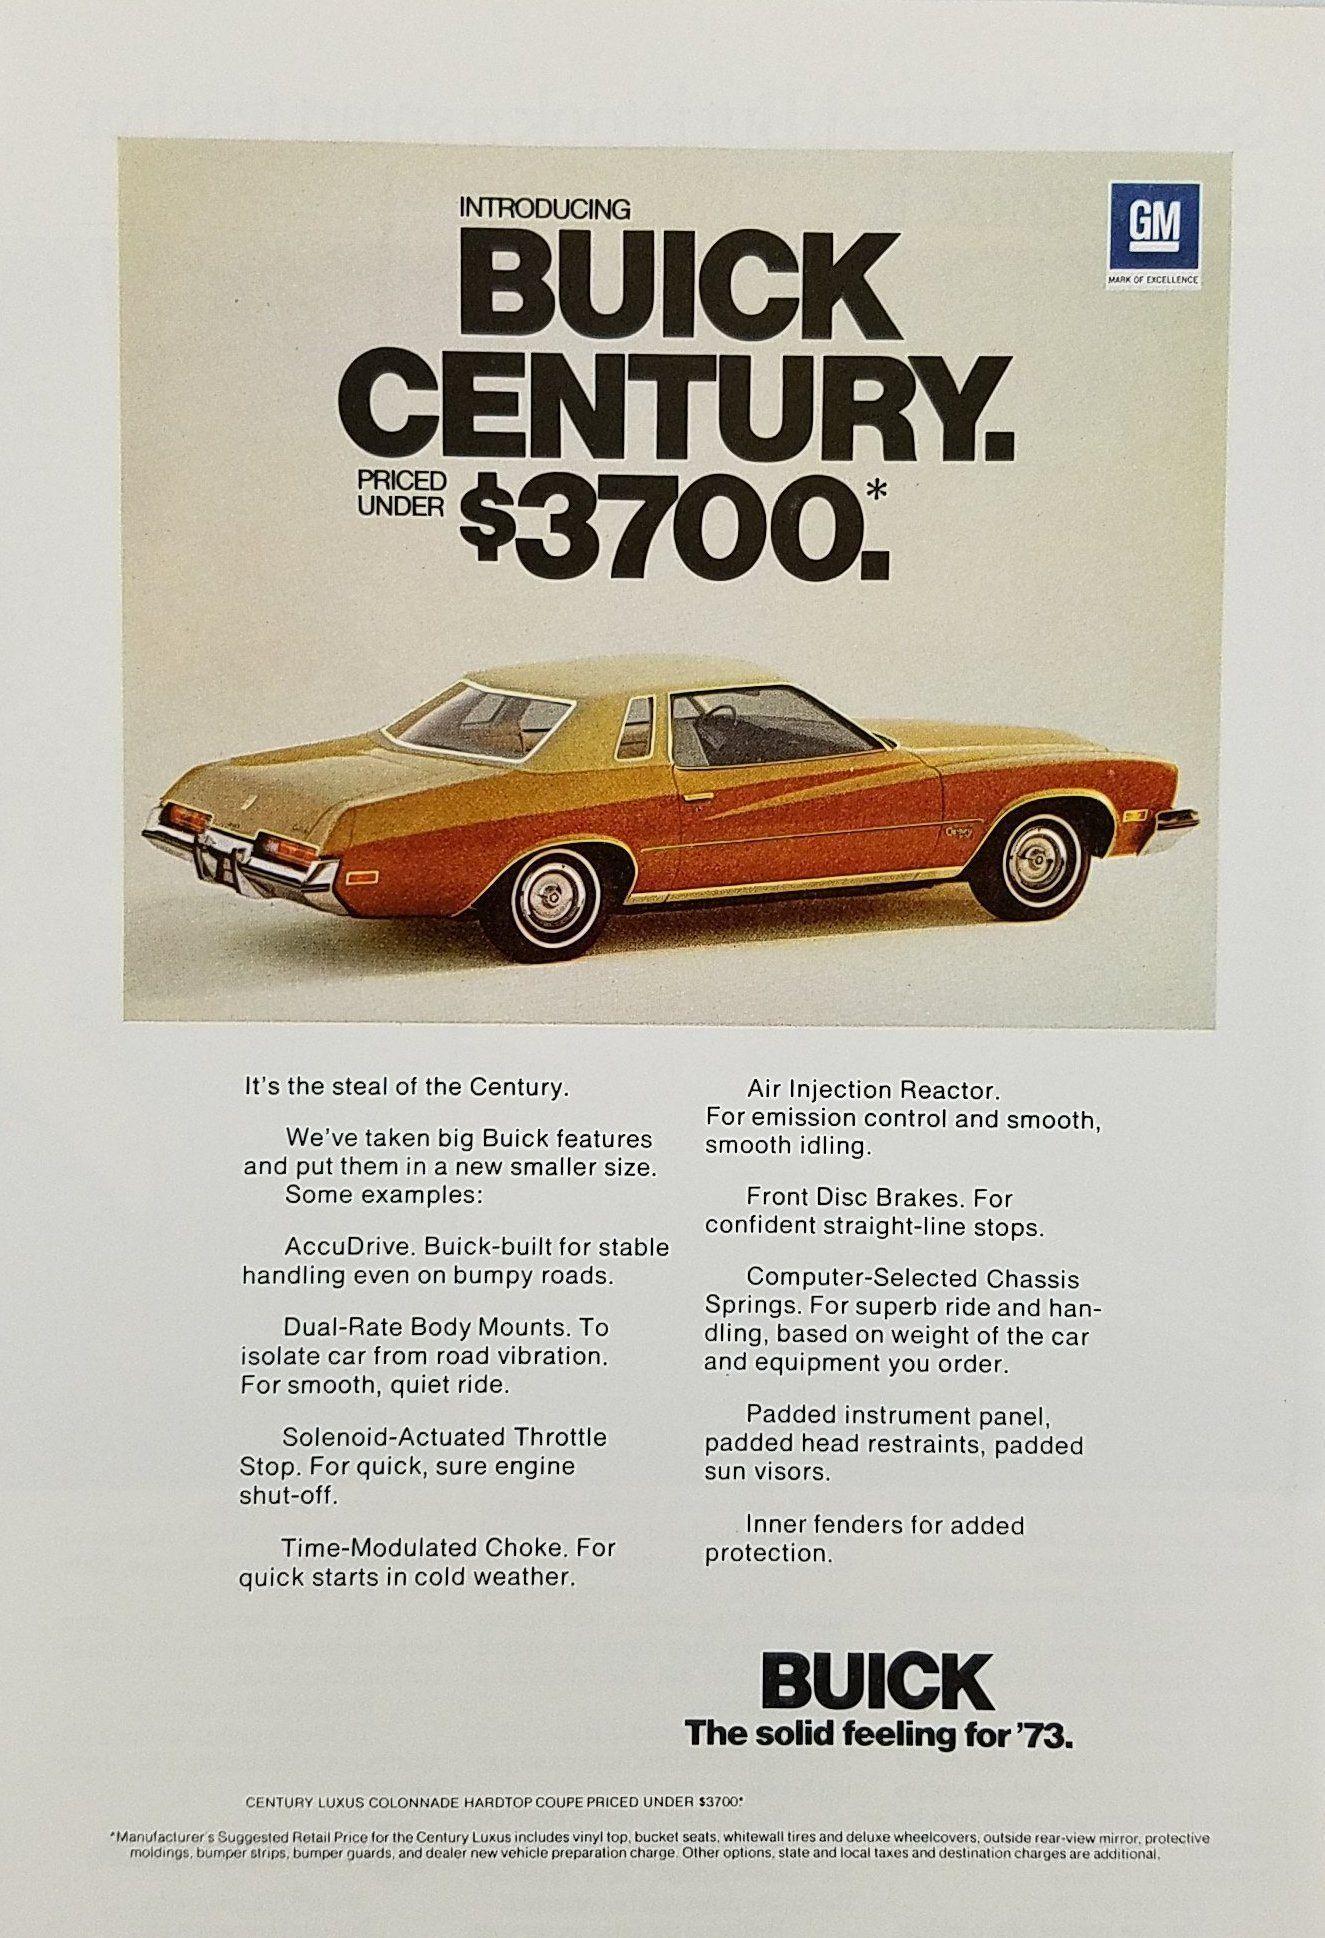 73 Buick Century : buick, century, Buick, Century, Automobile, Vintage, Century,, Buick,, Advertising